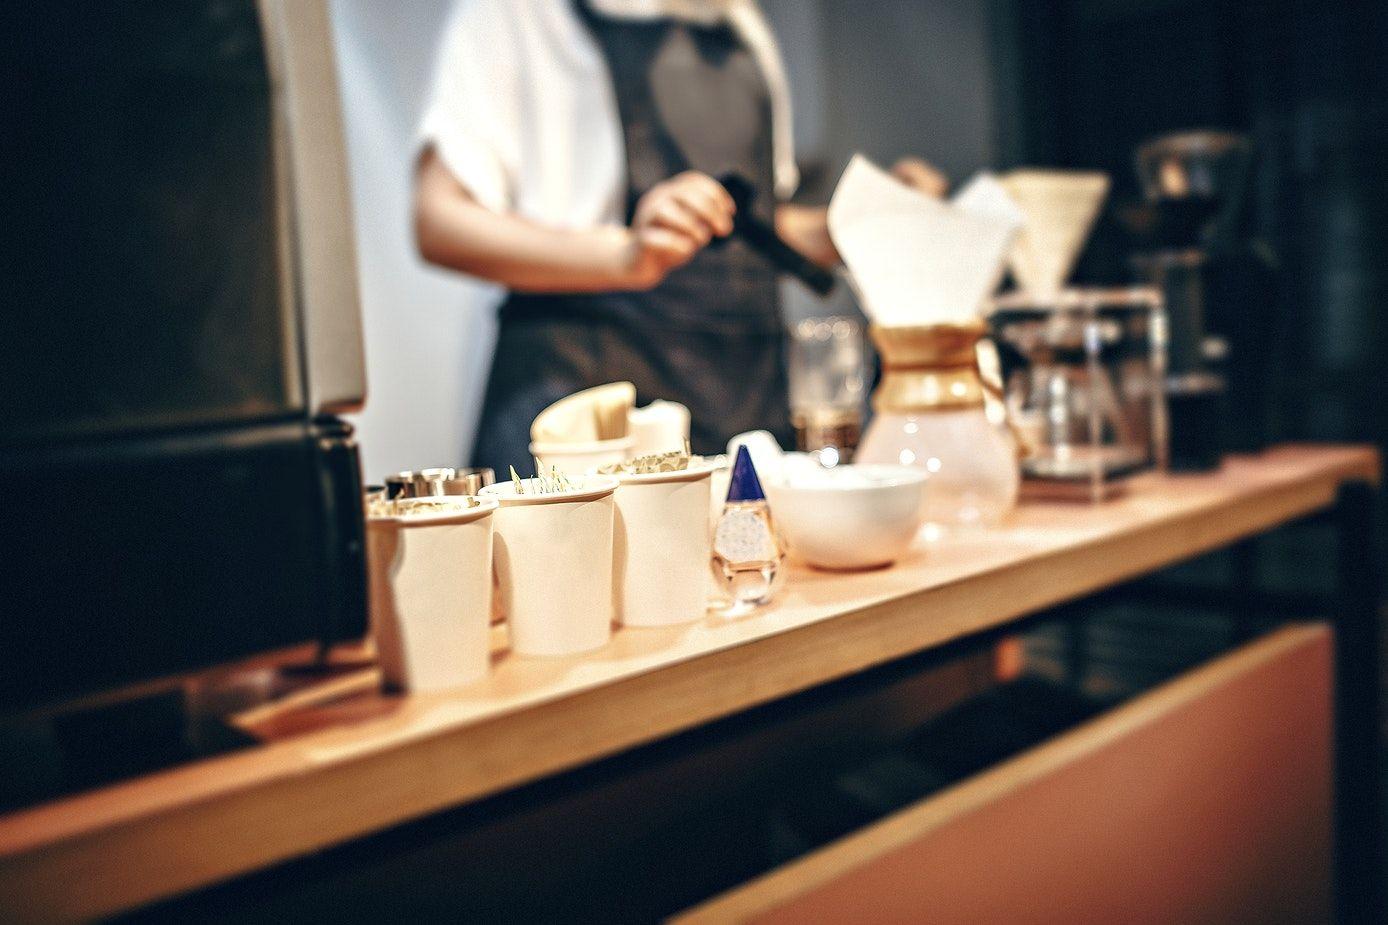 Aletta ocean fucks in a coffee shop